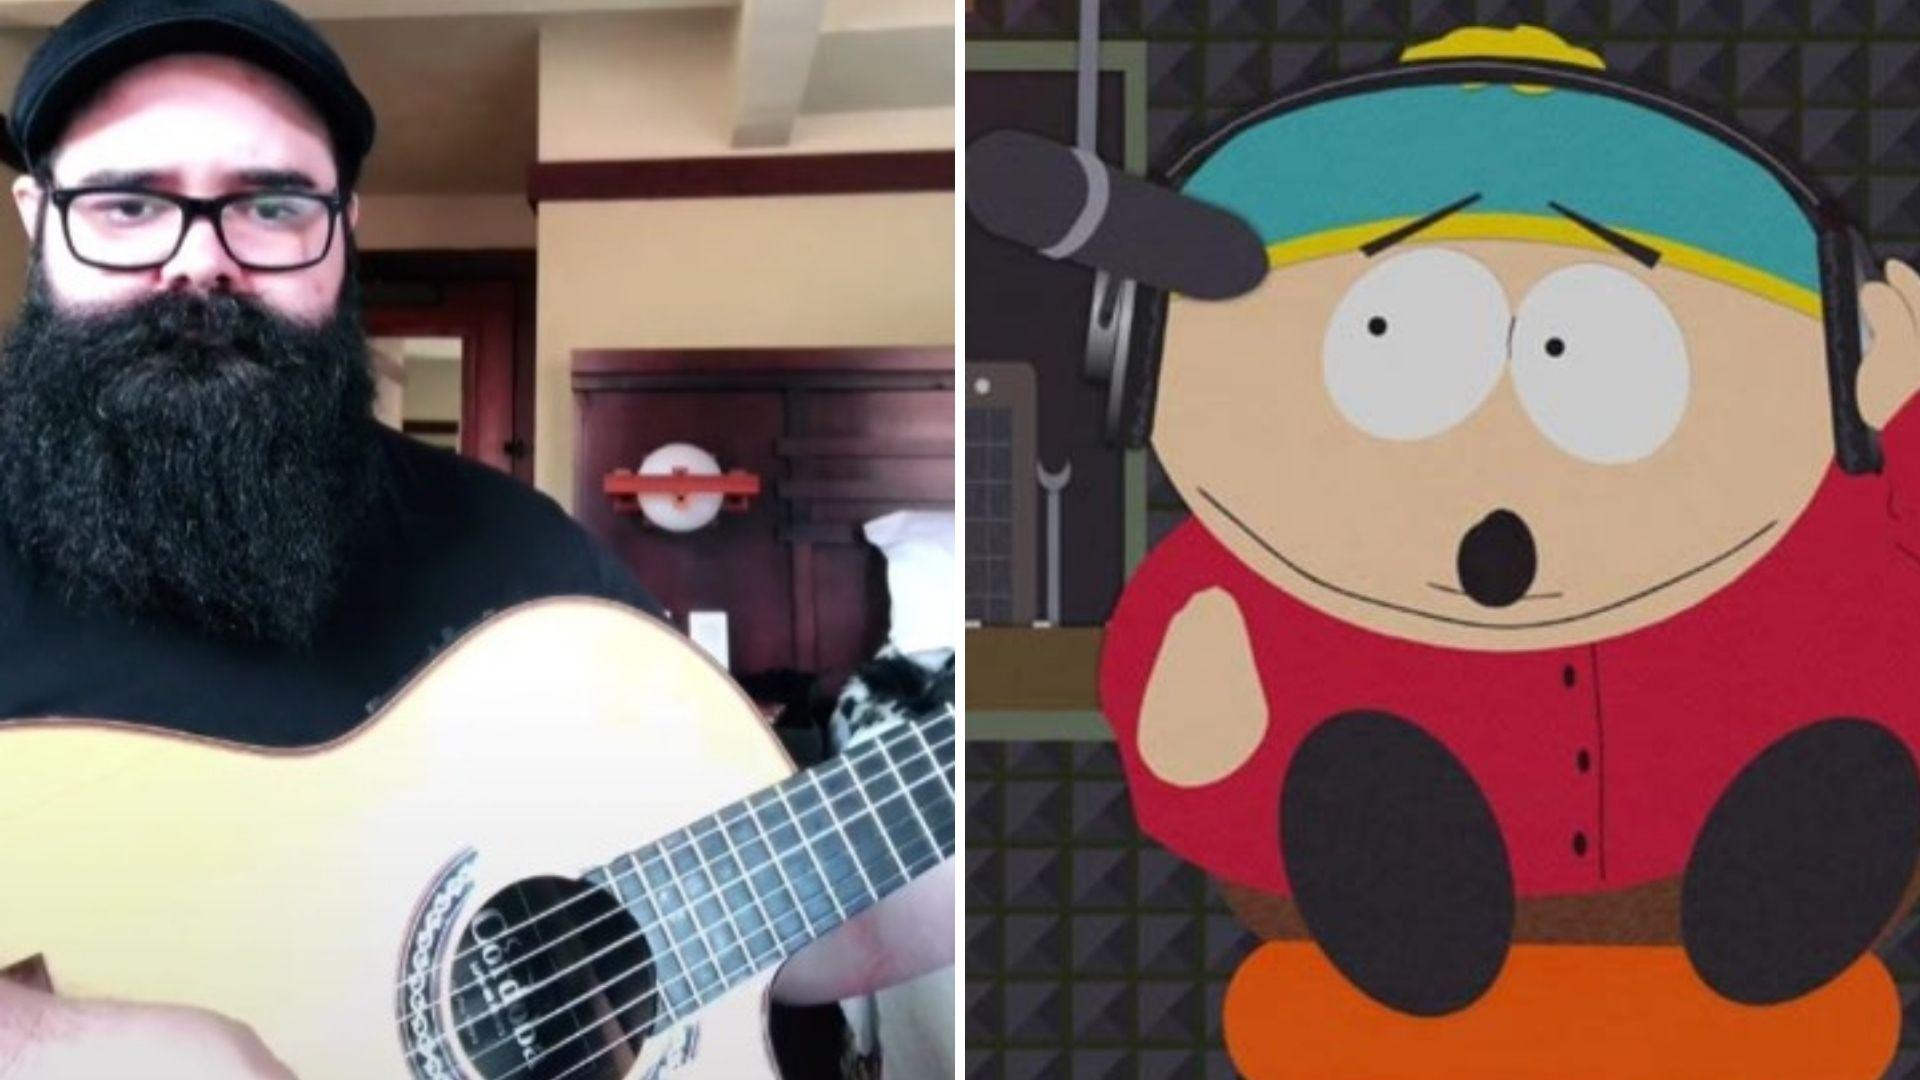 músico rock cartman south park